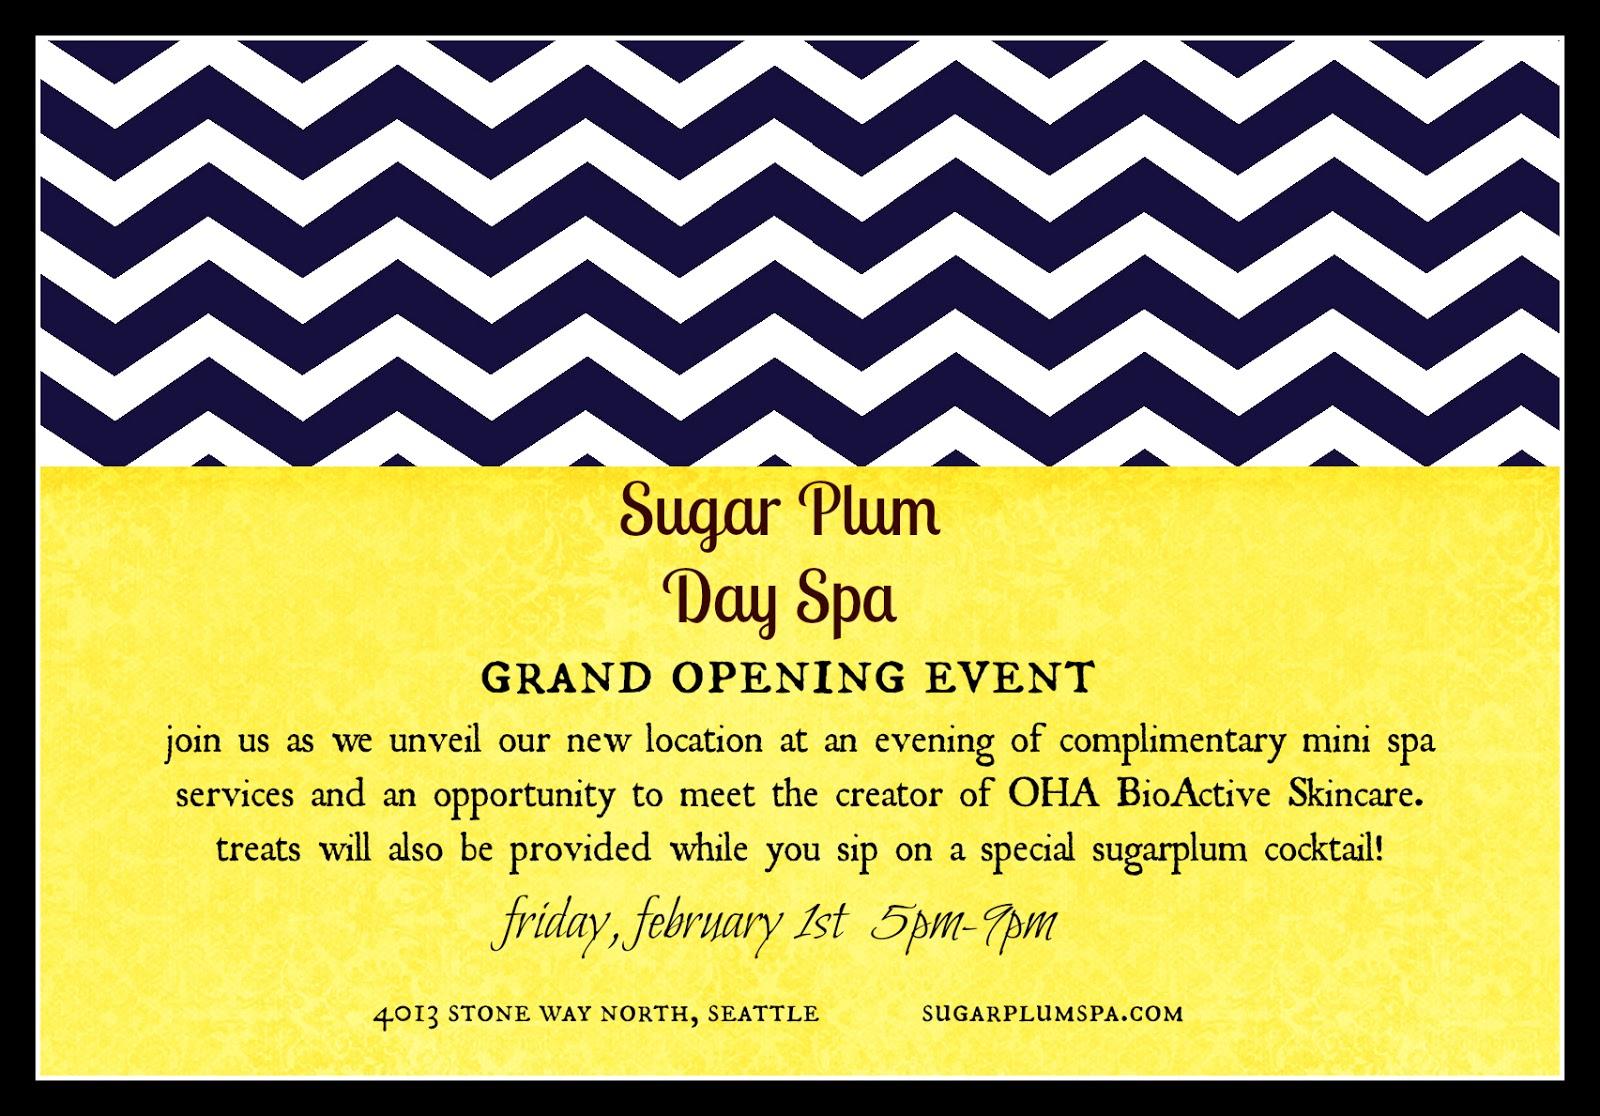 Sugar Plum Spa